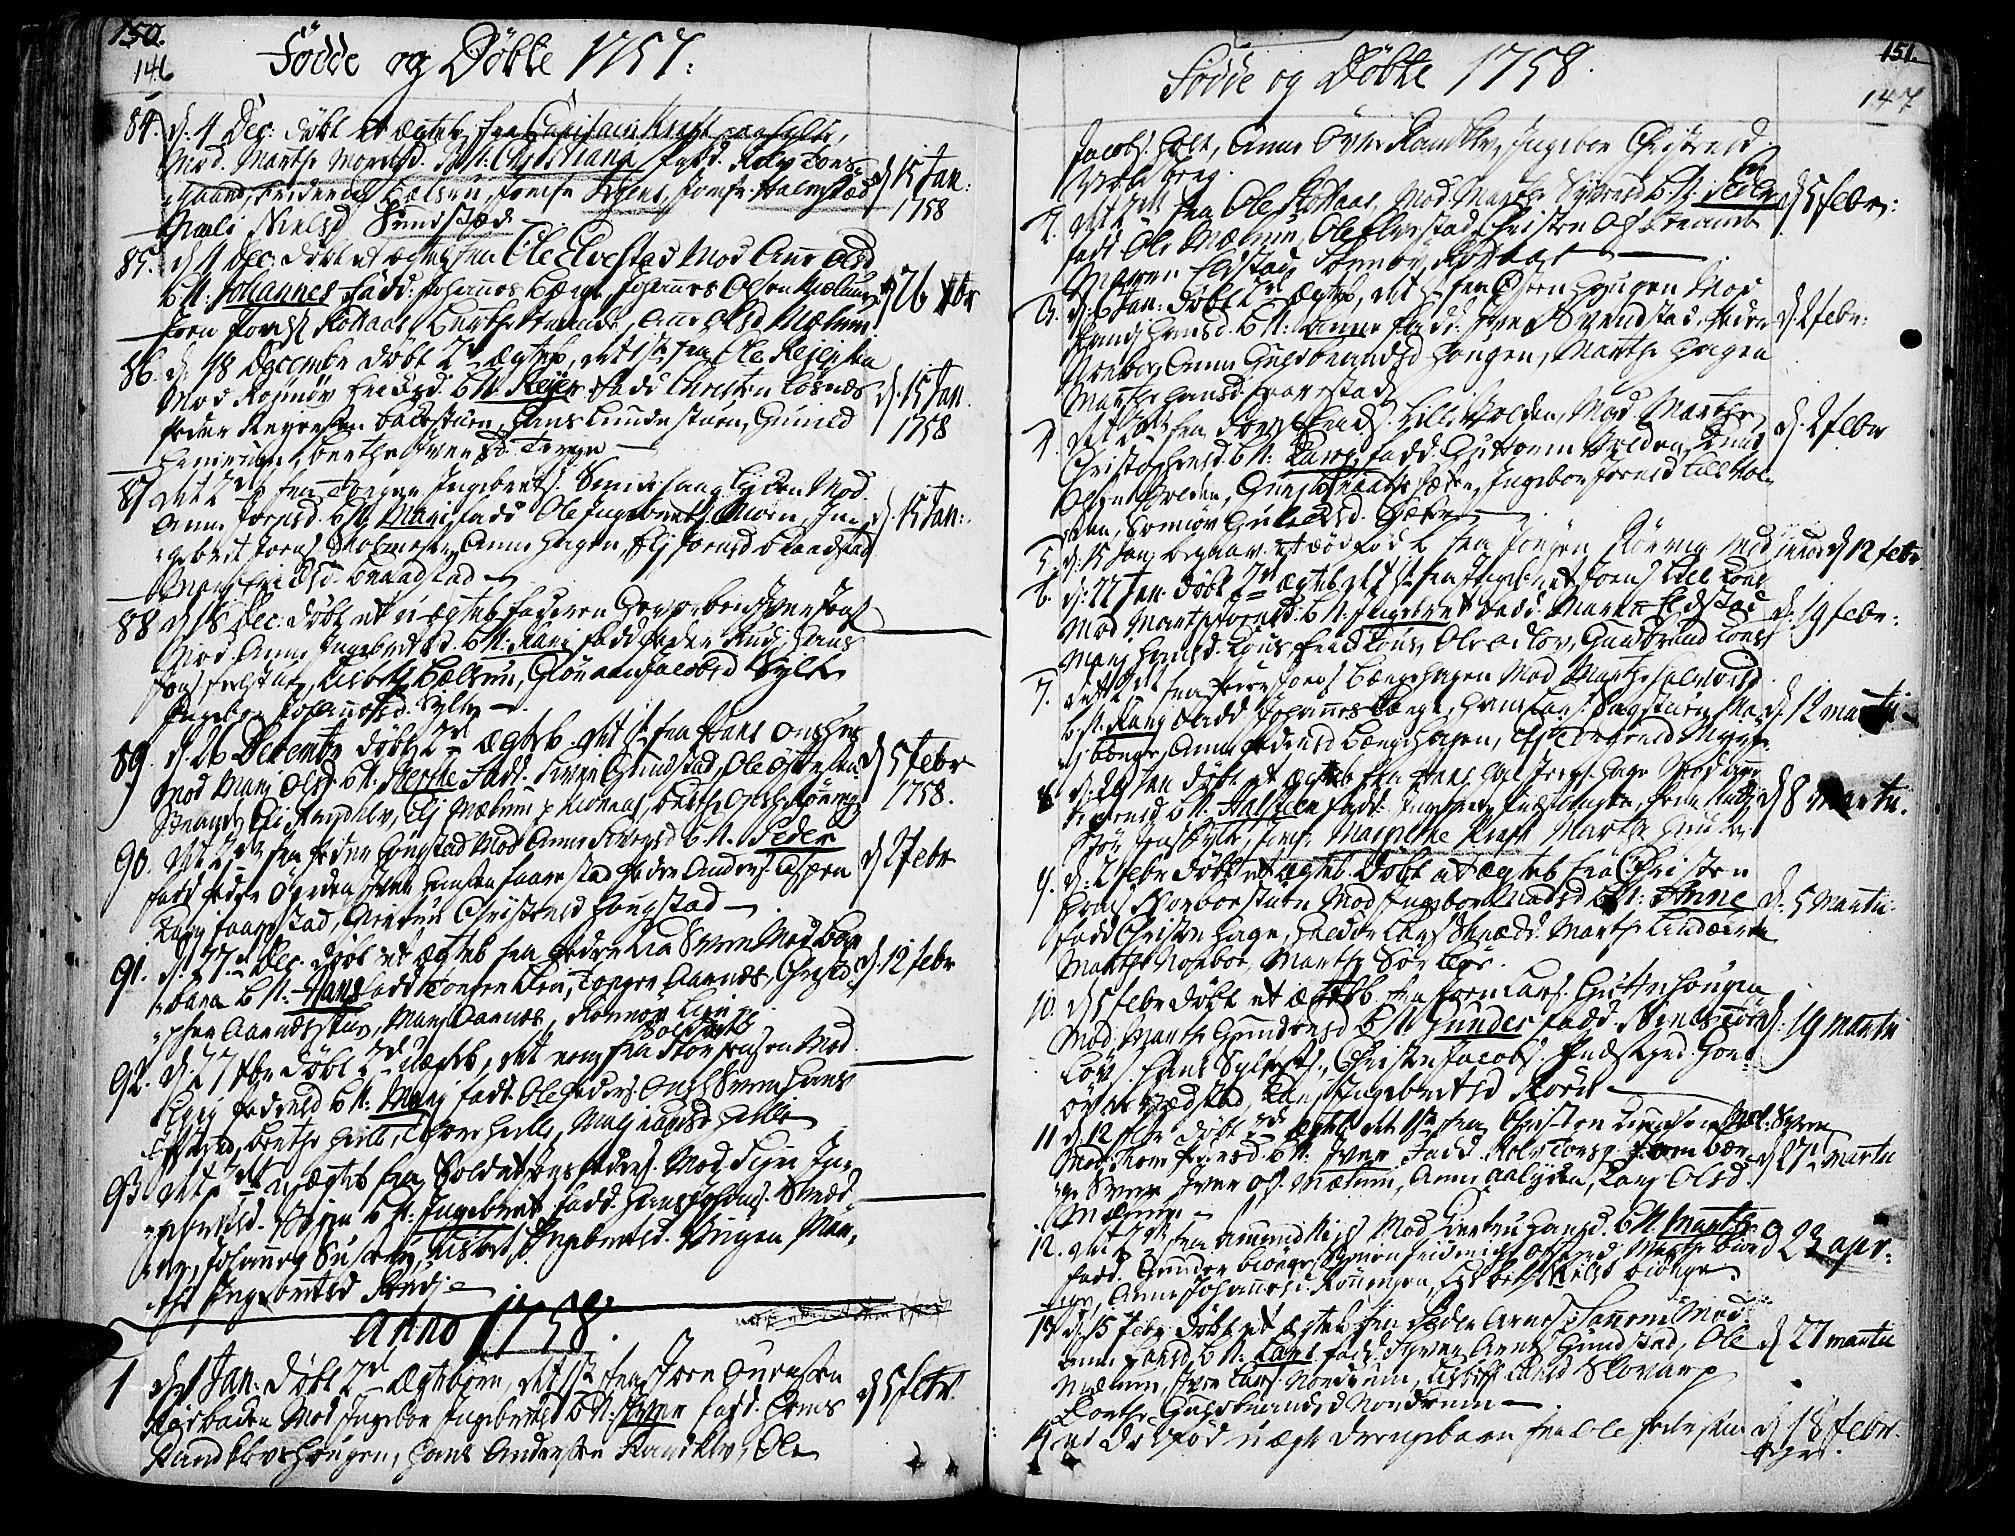 SAH, Ringebu prestekontor, Ministerialbok nr. 2, 1734-1780, s. 146-147